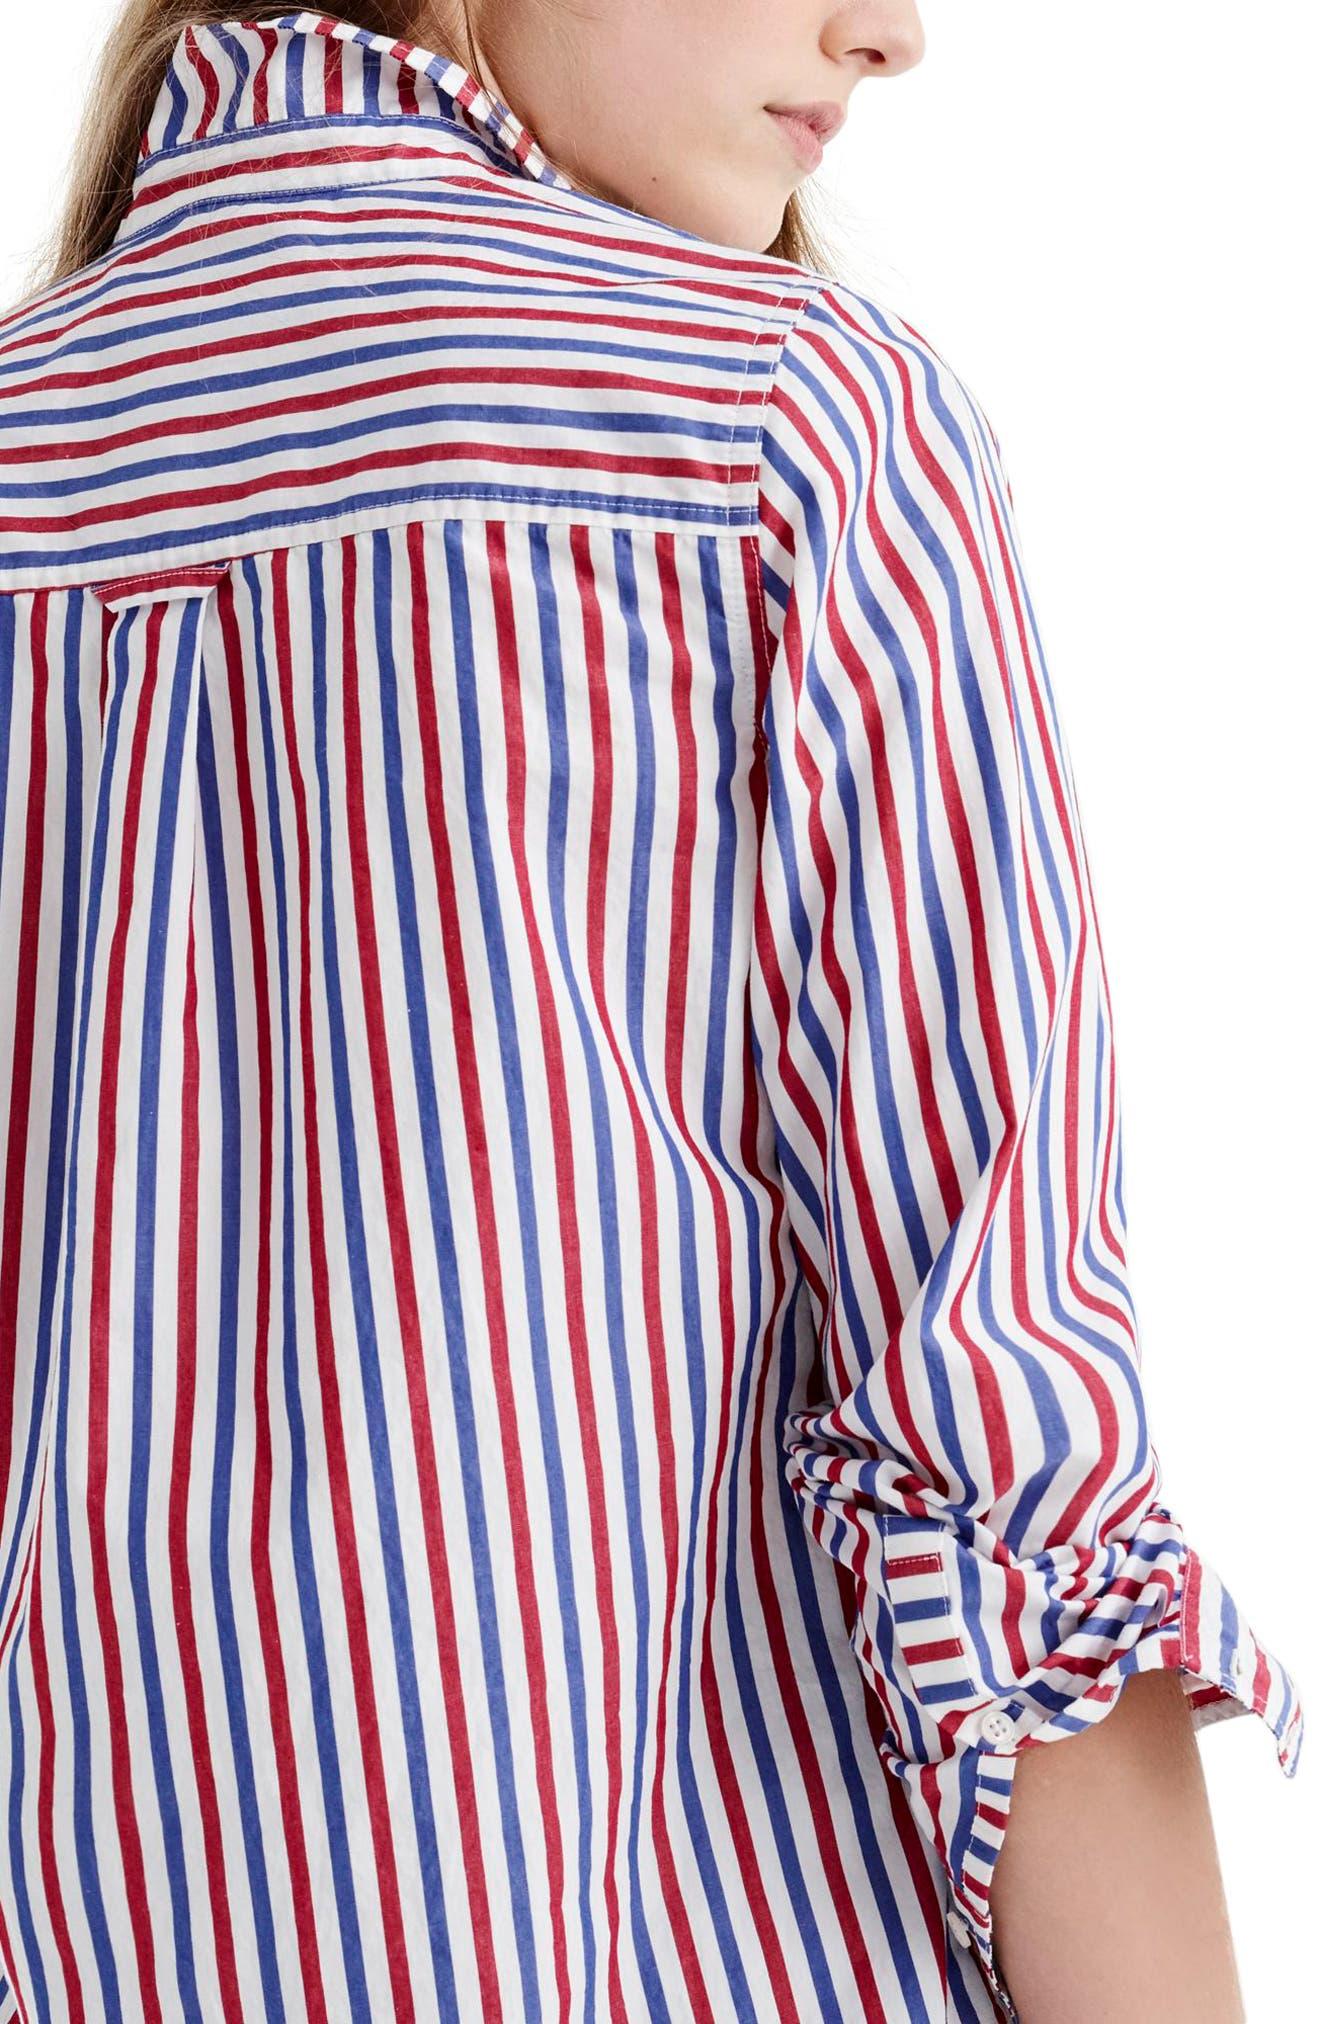 J. Crew Stripe Boyfriend Shirt,                             Alternate thumbnail 3, color,                             600